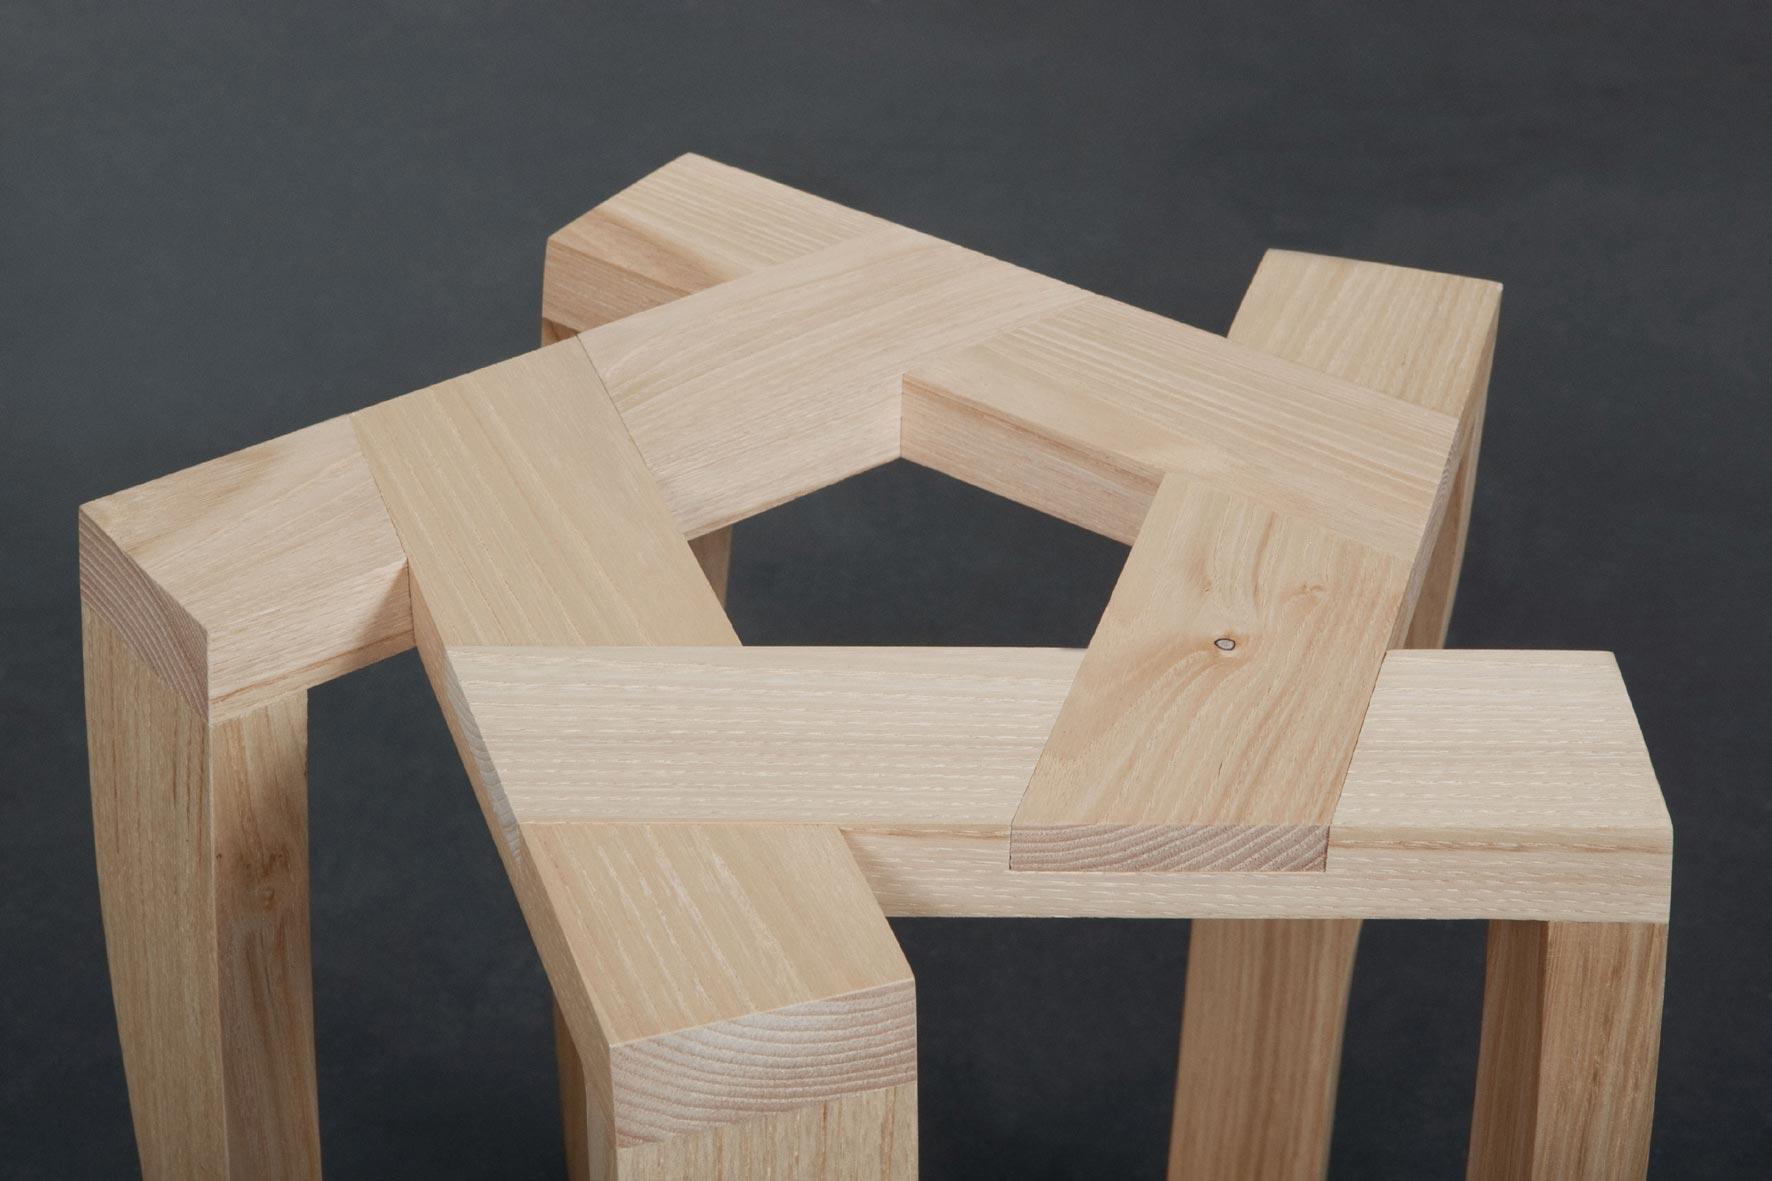 tabouret pentagon la fabrique. Black Bedroom Furniture Sets. Home Design Ideas